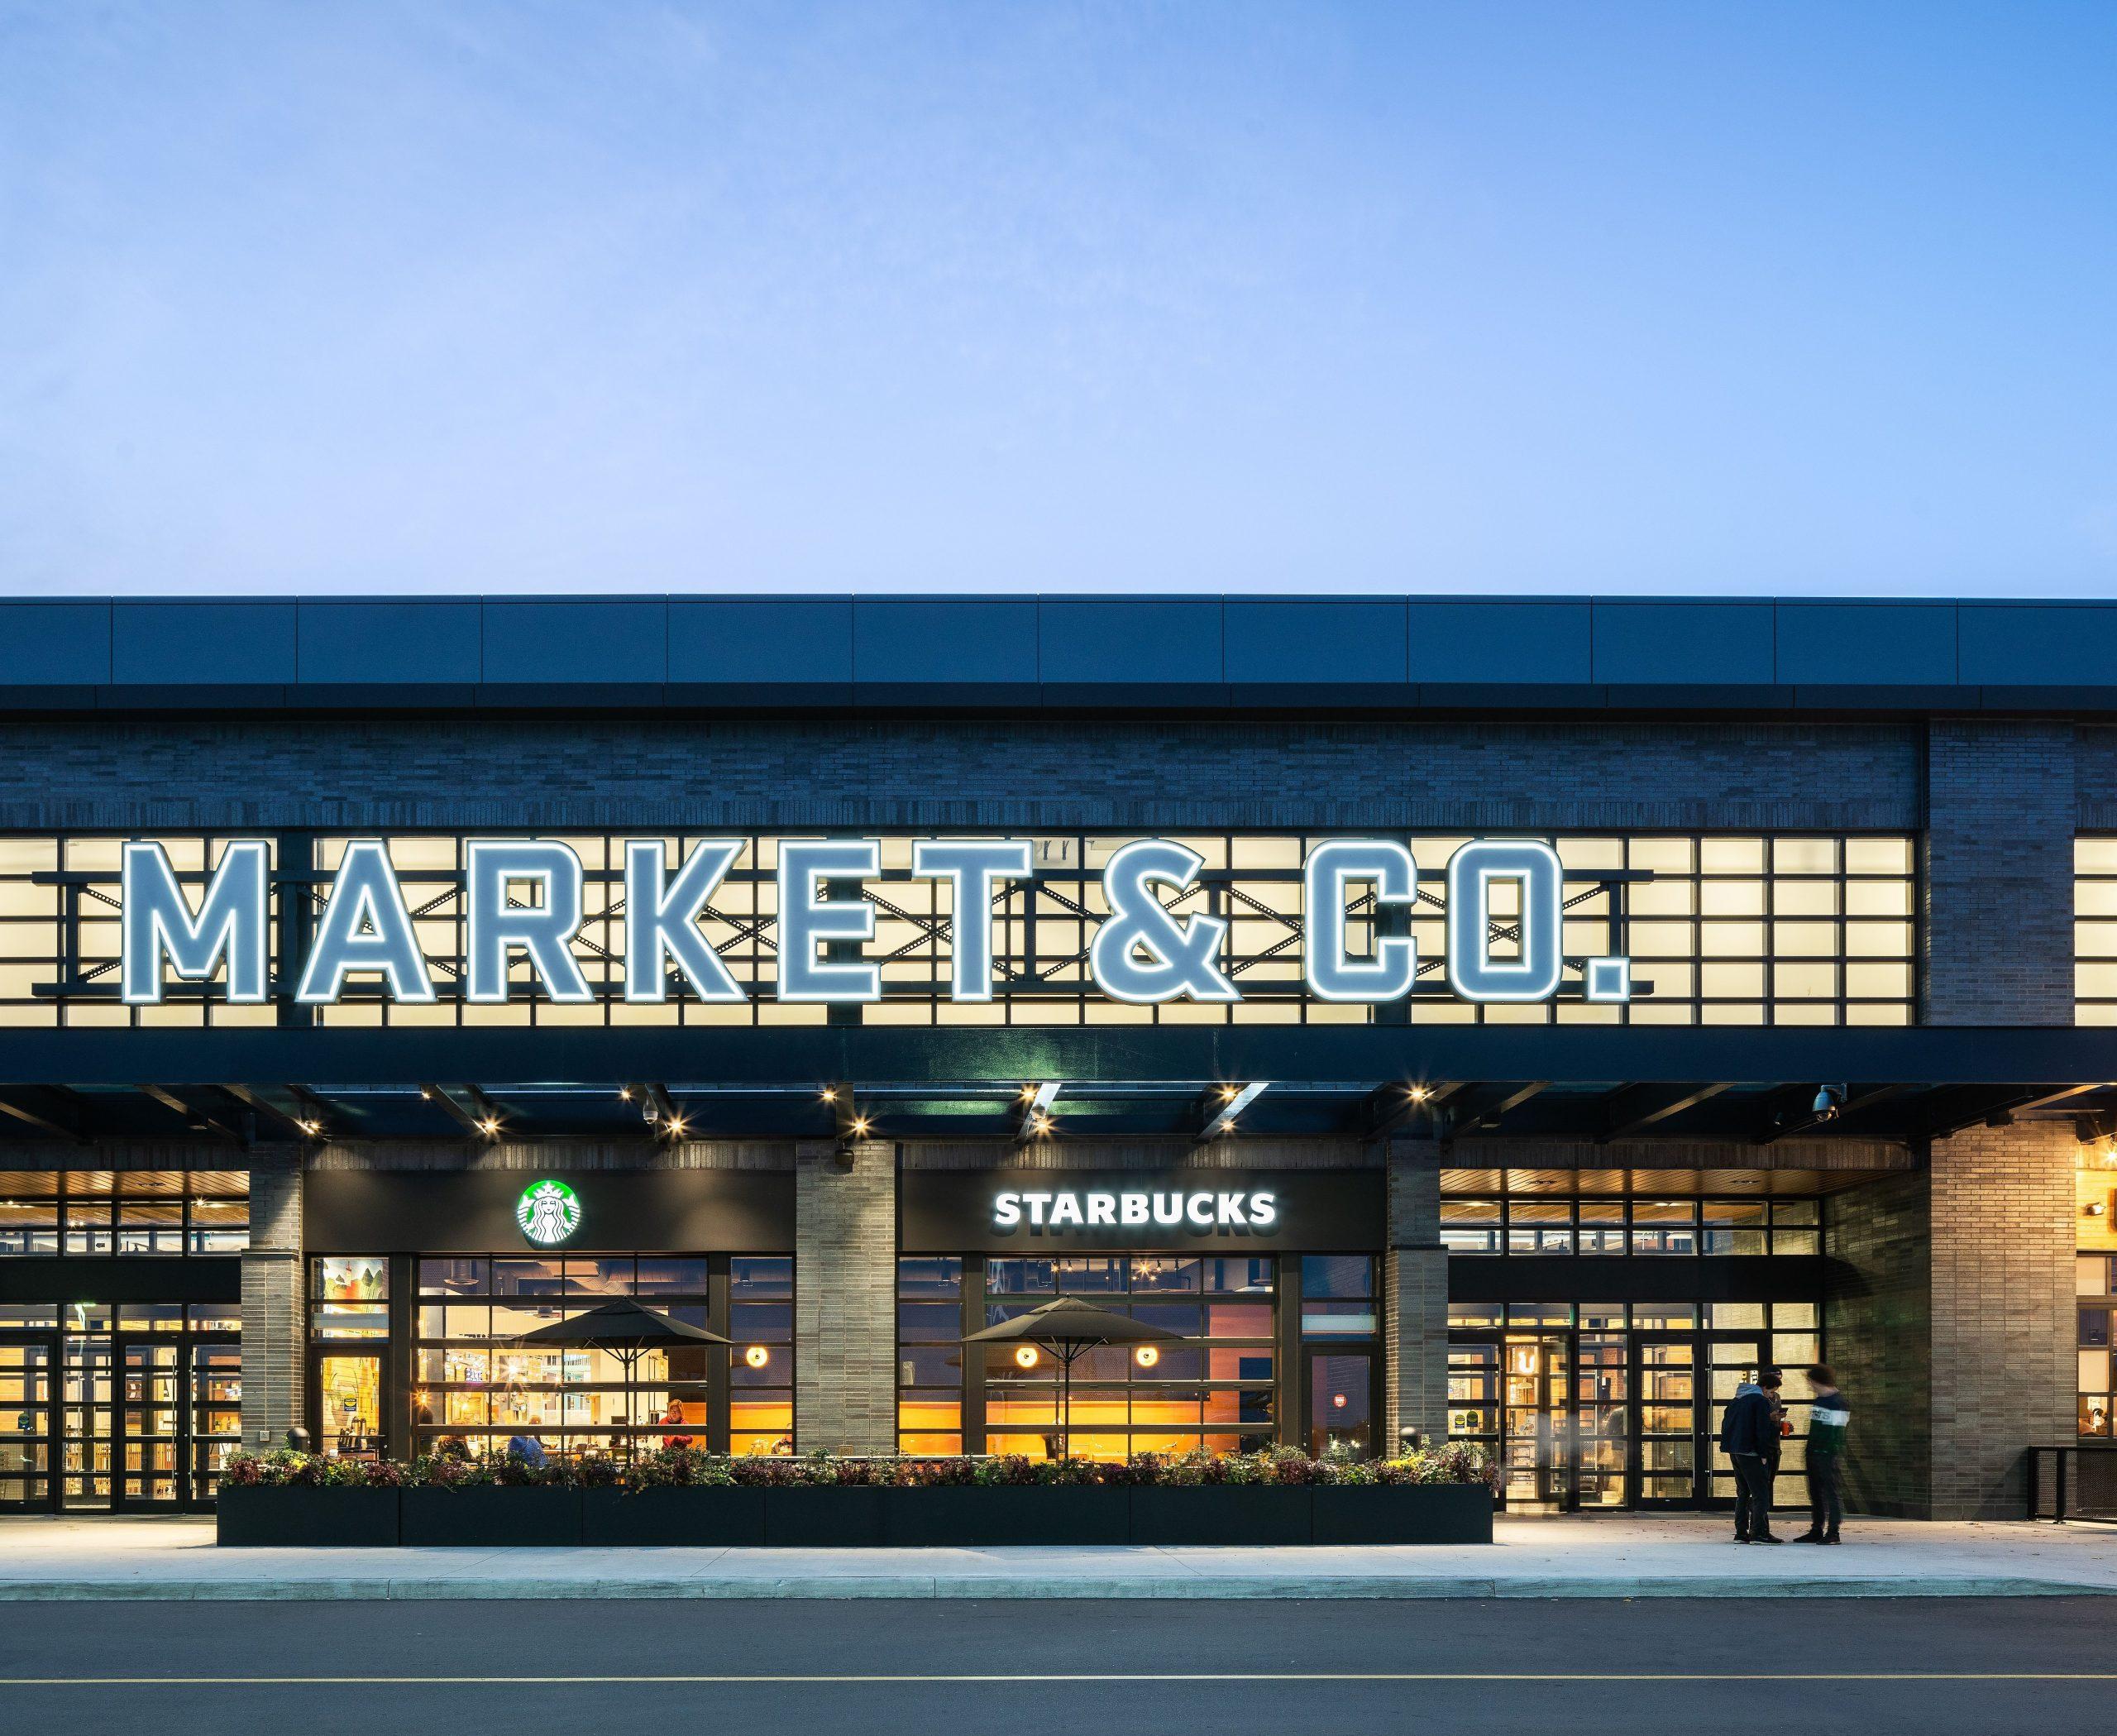 market and co exterior entrance